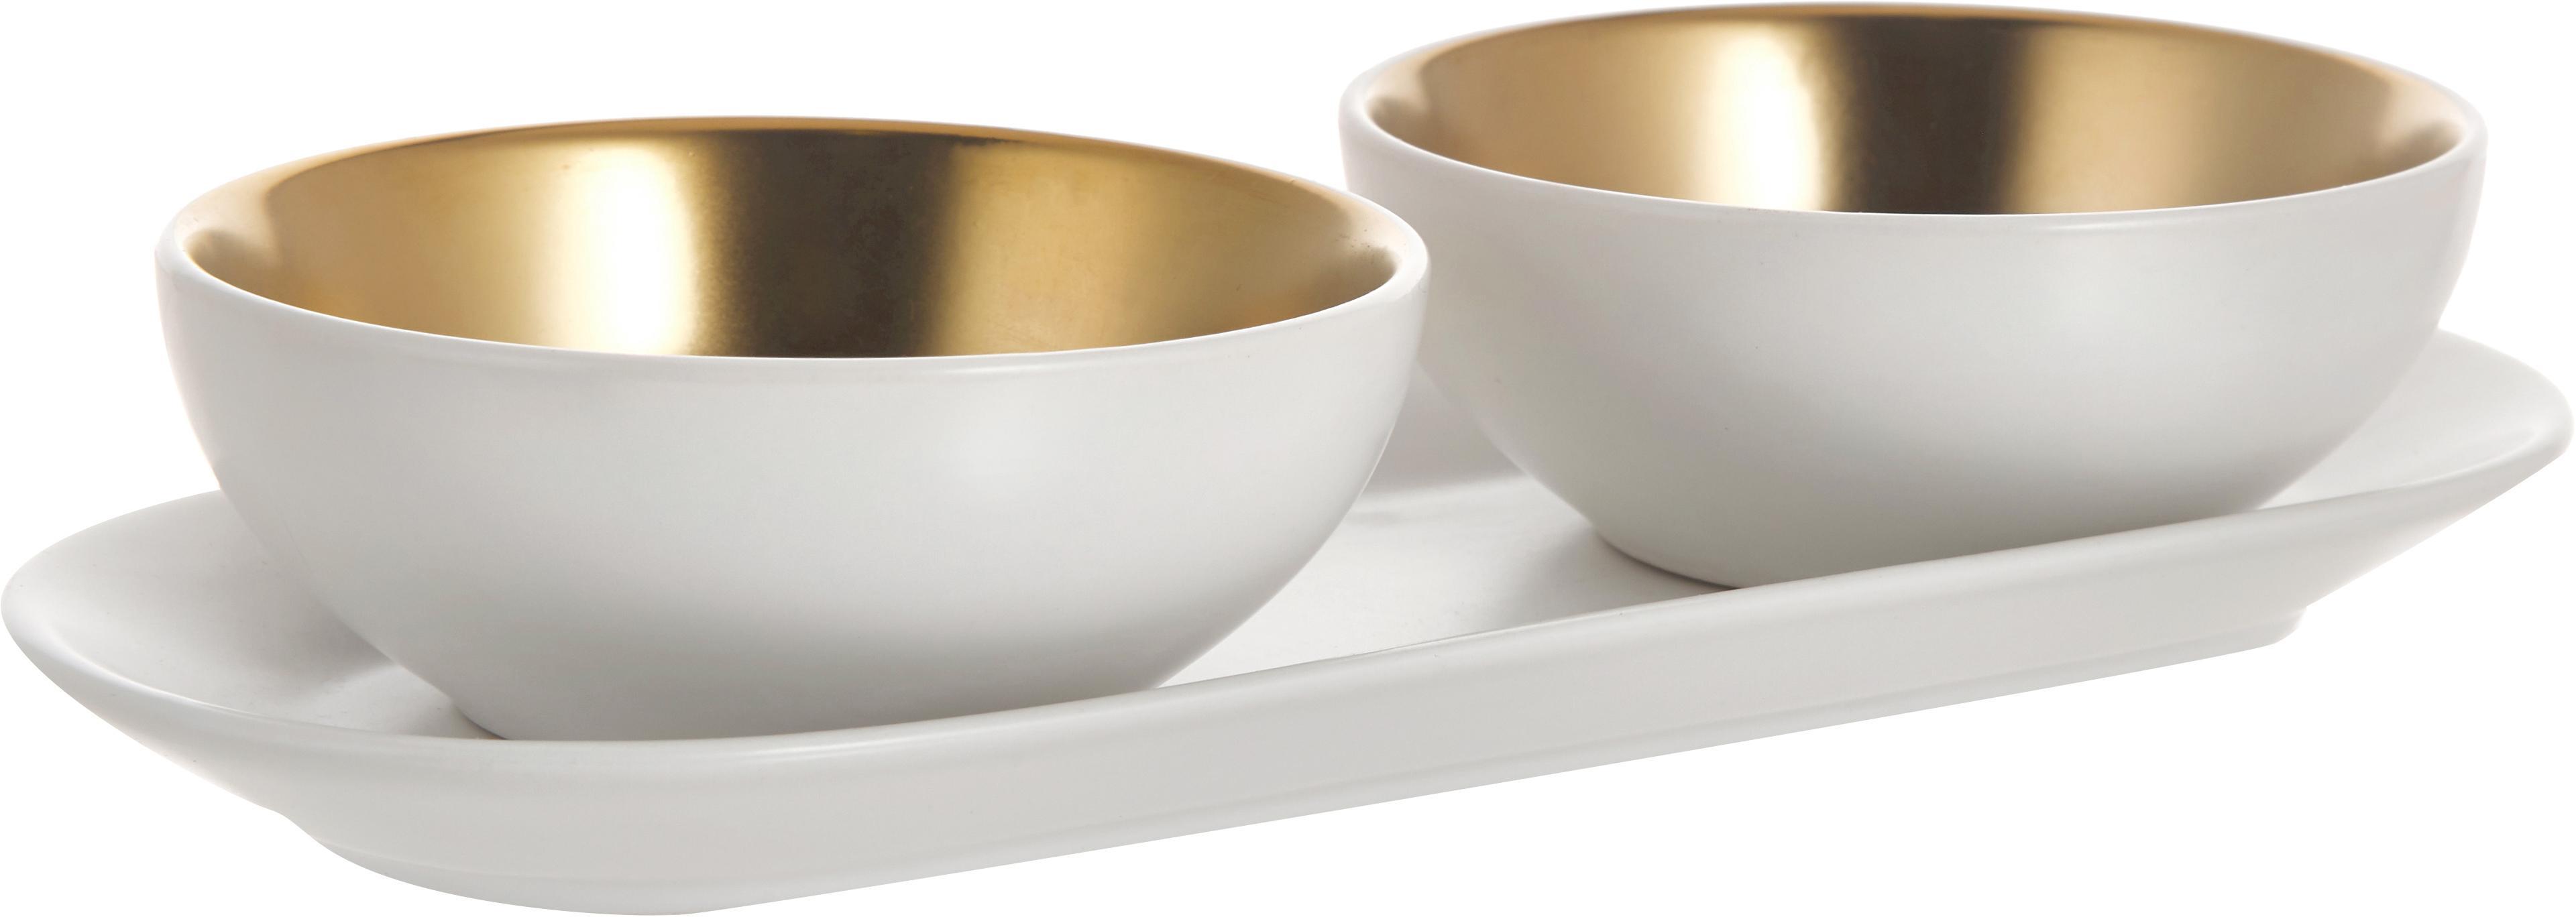 Serveerset Glitz, 3-delig, Keramiek, Wit, goudkleurig, Ø 10 x H 4 cm